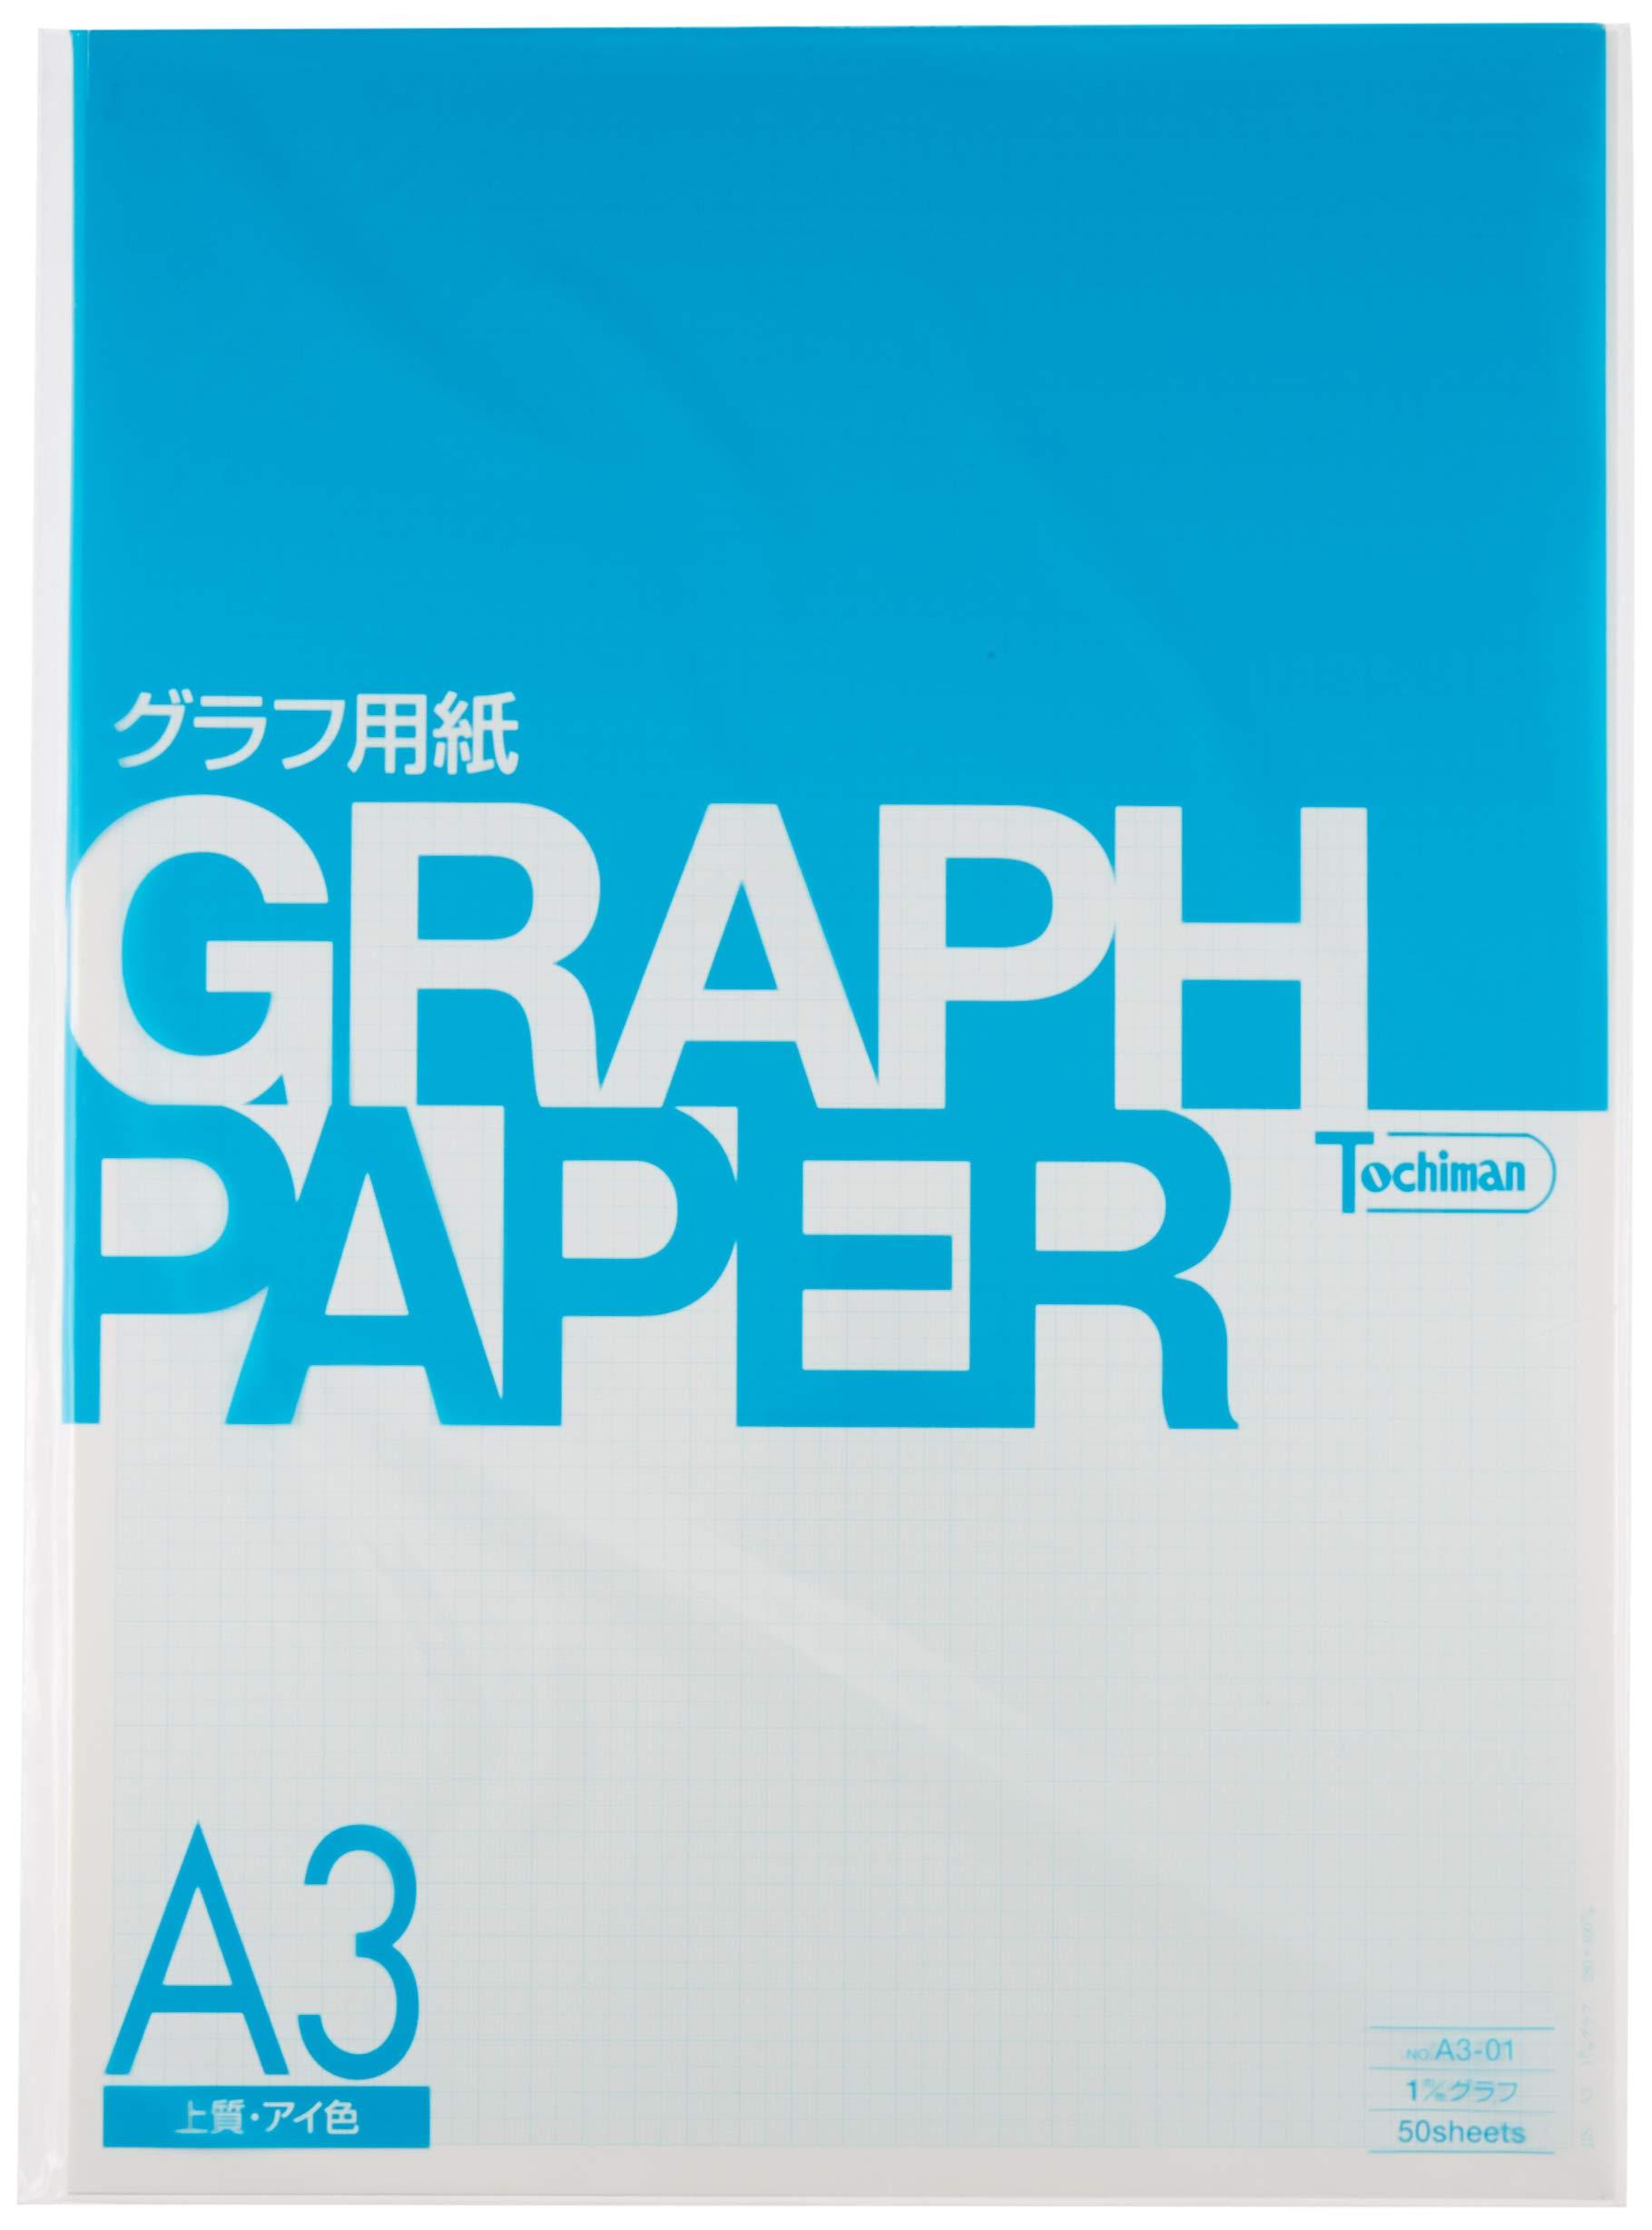 Sakaeshigyo Tochiman graph paper 1 mm grid A3 50 sheets eye color paper 81.4 g A3-01